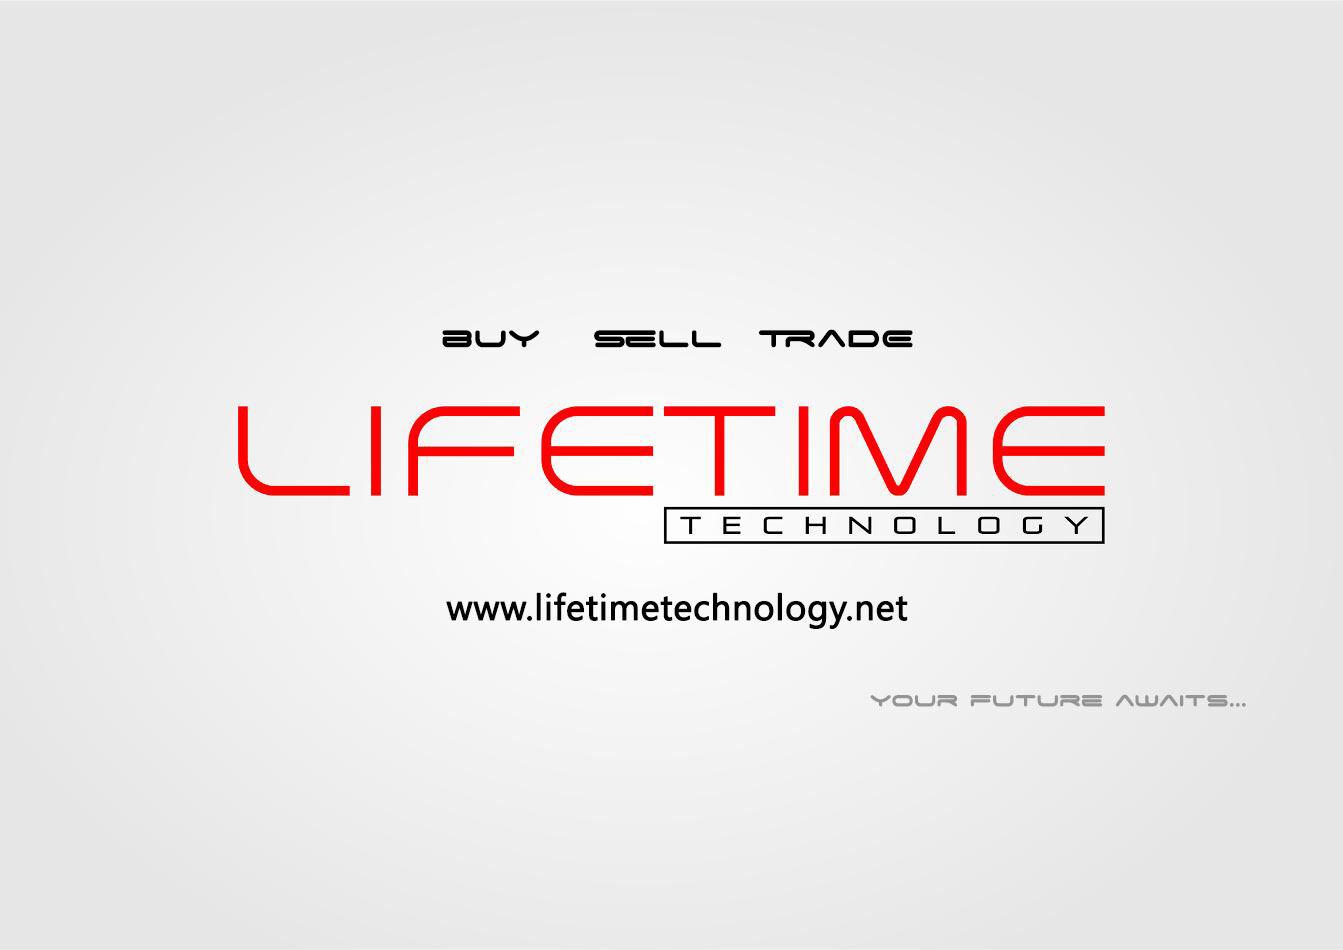 Lifetime Technology